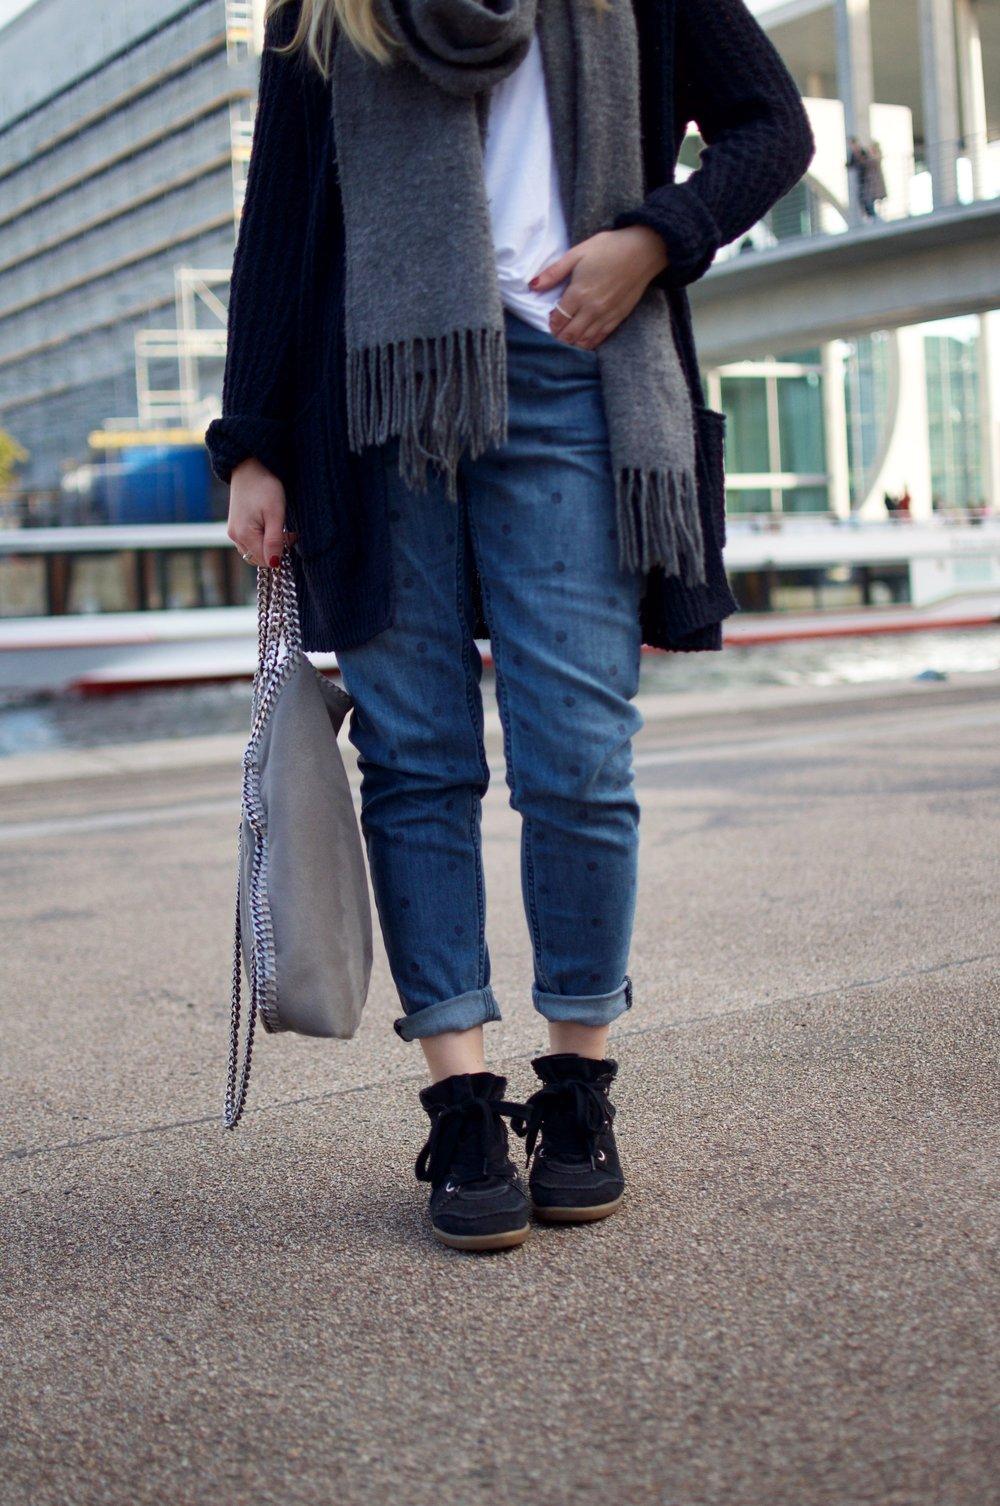 Fashion-Blogger-Berlin-Isabel-Marant-Bobby-Sneaker-Stella-McCartney-Falabellabag-Isabel-Marant